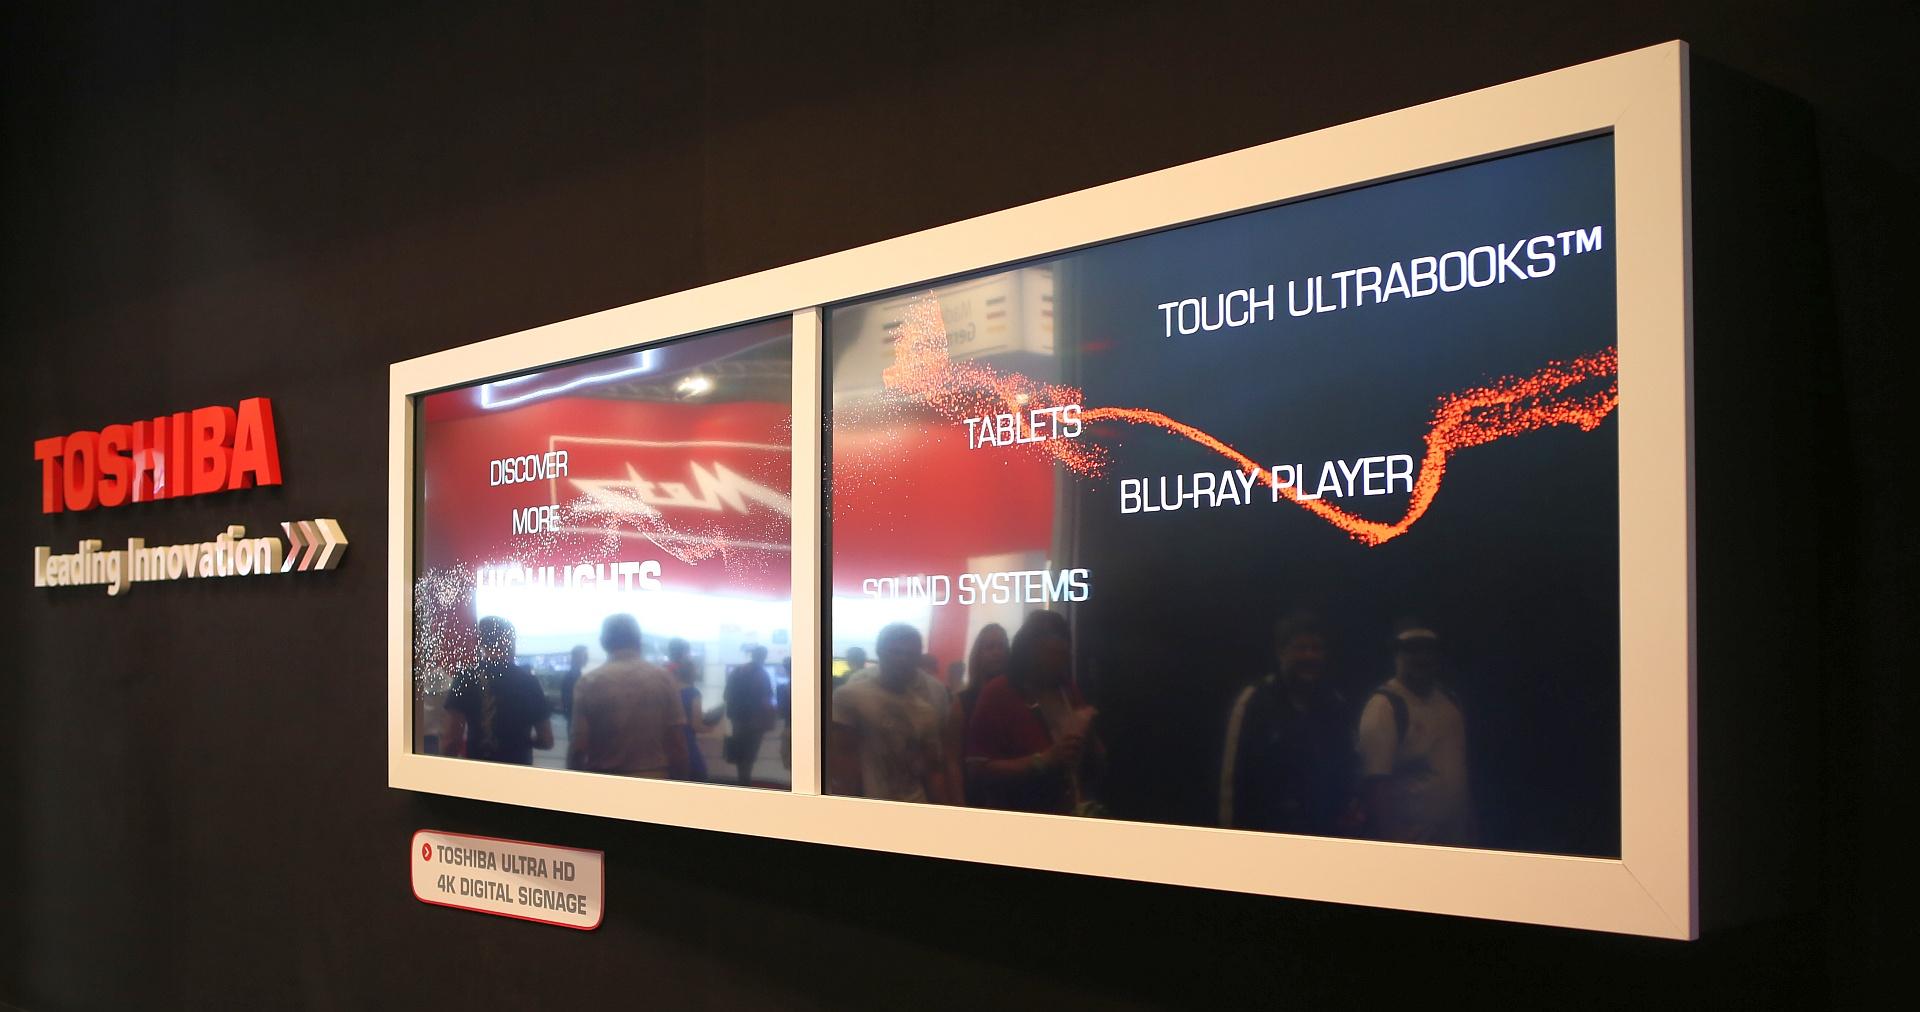 Toshiba si nevoia de inovatie, la IFA 2013